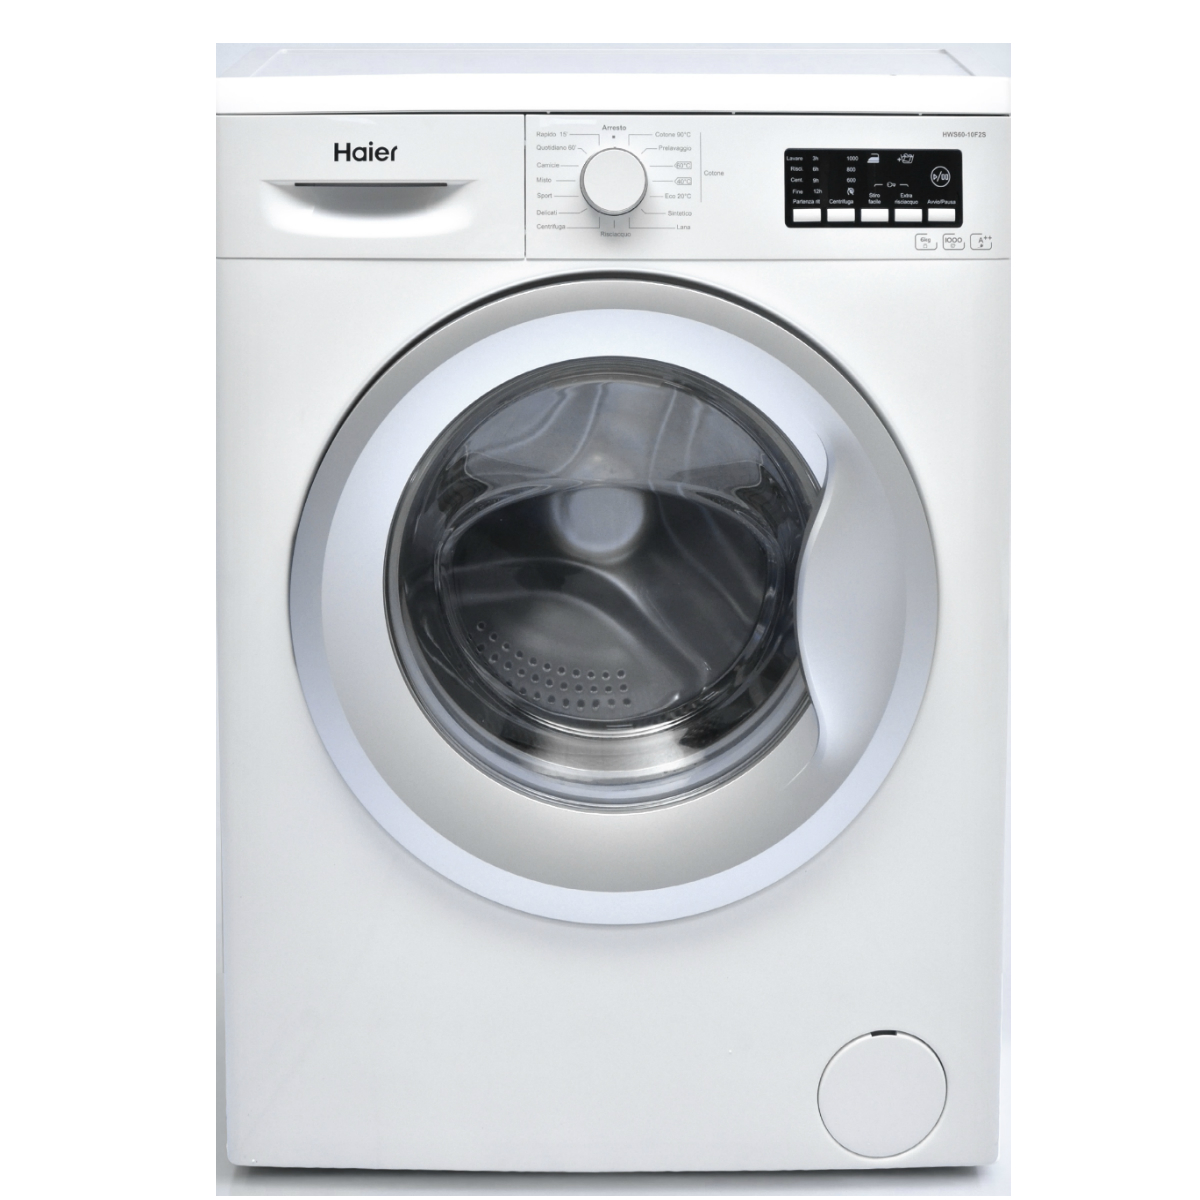 Lavatrice haier hws60 10f2s caratteristiche lavatrice for Peso lavatrice